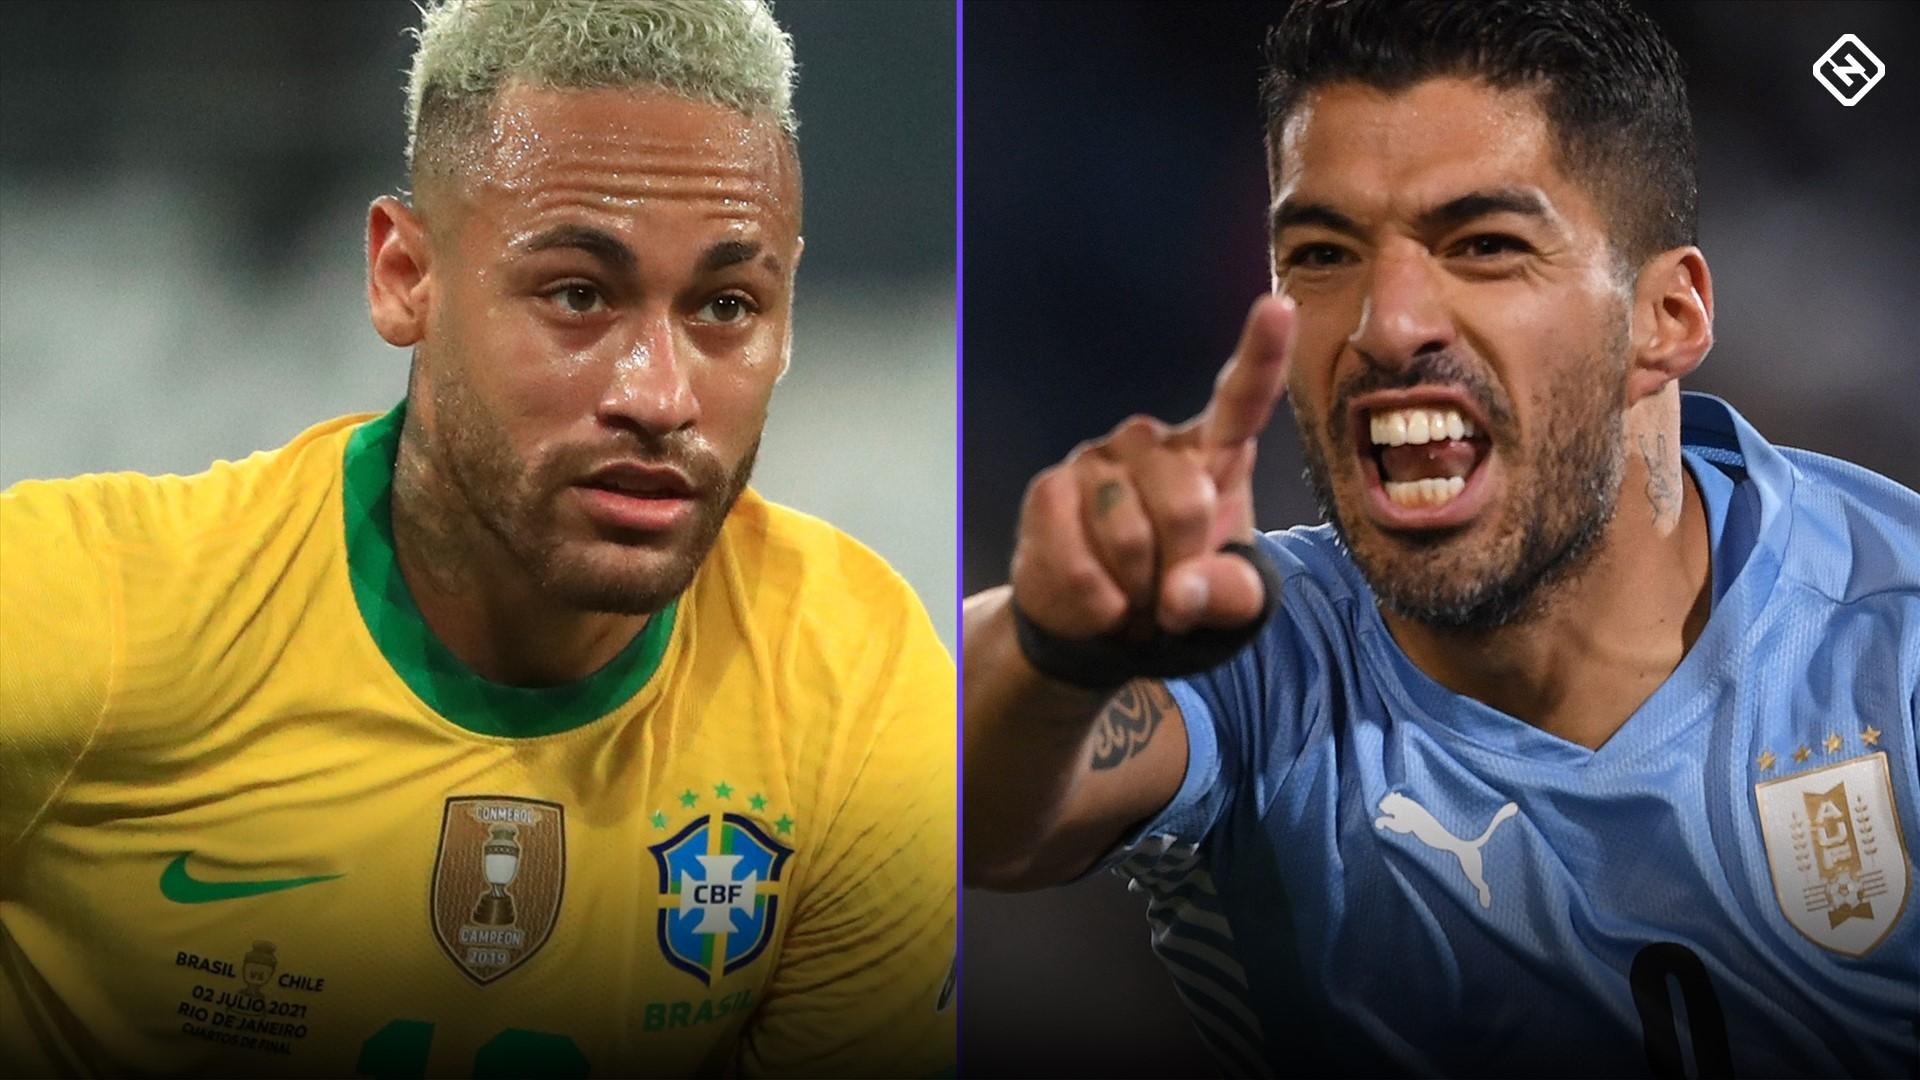 neymar brazil luis suarez uruguay 3kq5nvf6arat1ui83444nryka